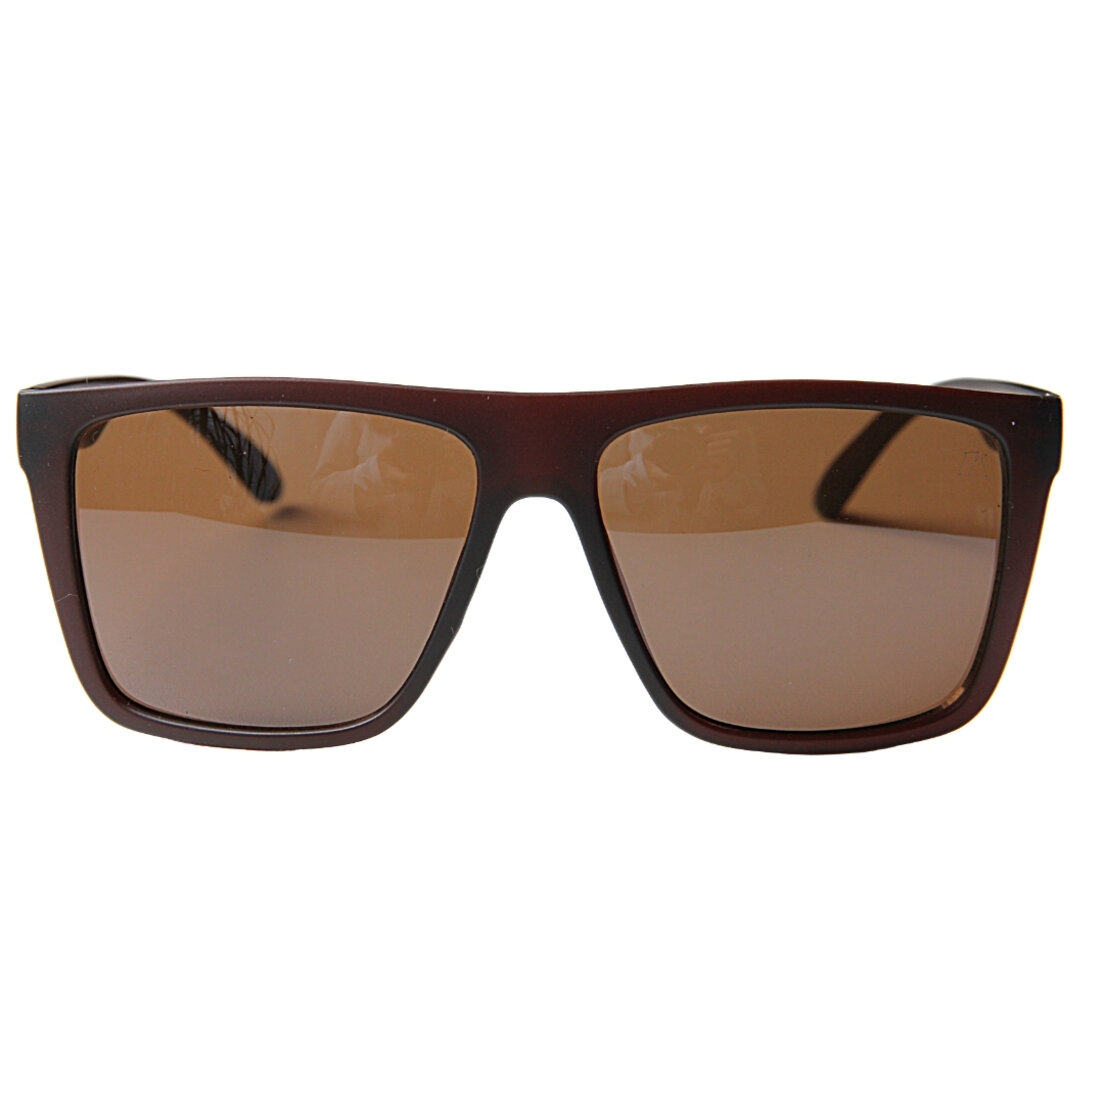 OUTLET - Óculos de Sol Khatto Square Marlon